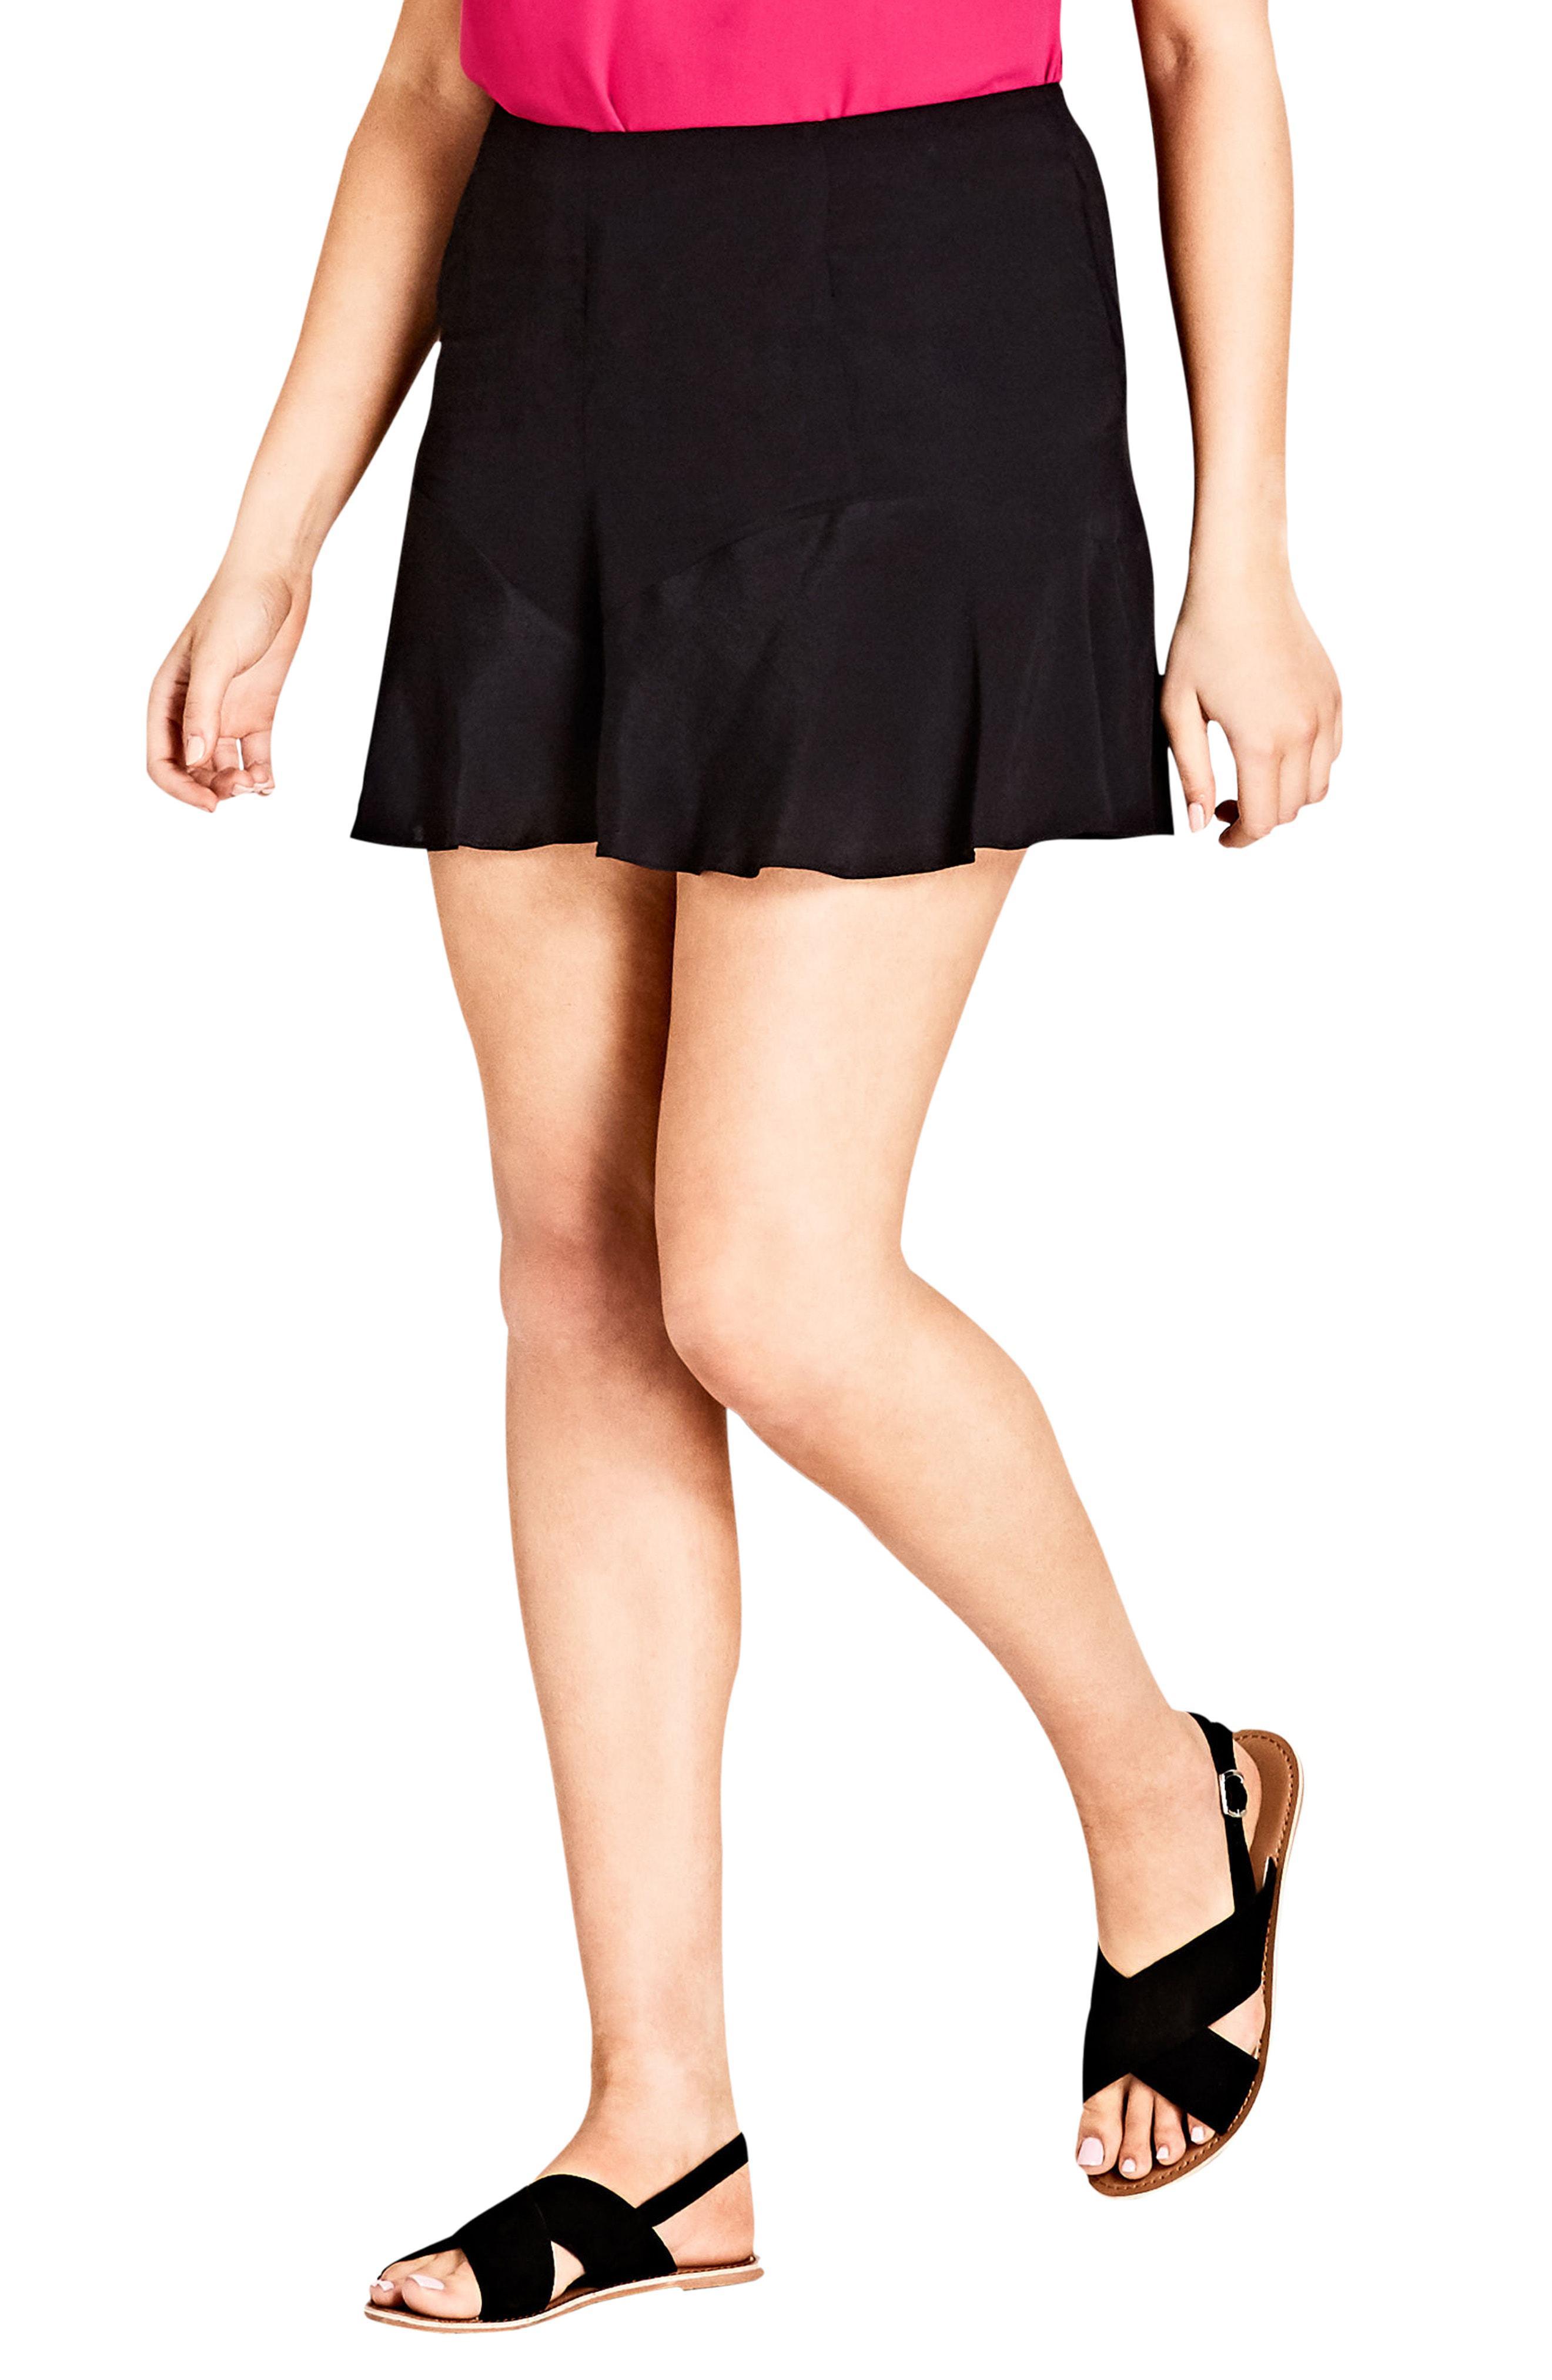 58e994f2707 Lyst - City Chic High Rise Ruffle Hem Shorts in Black - Save ...